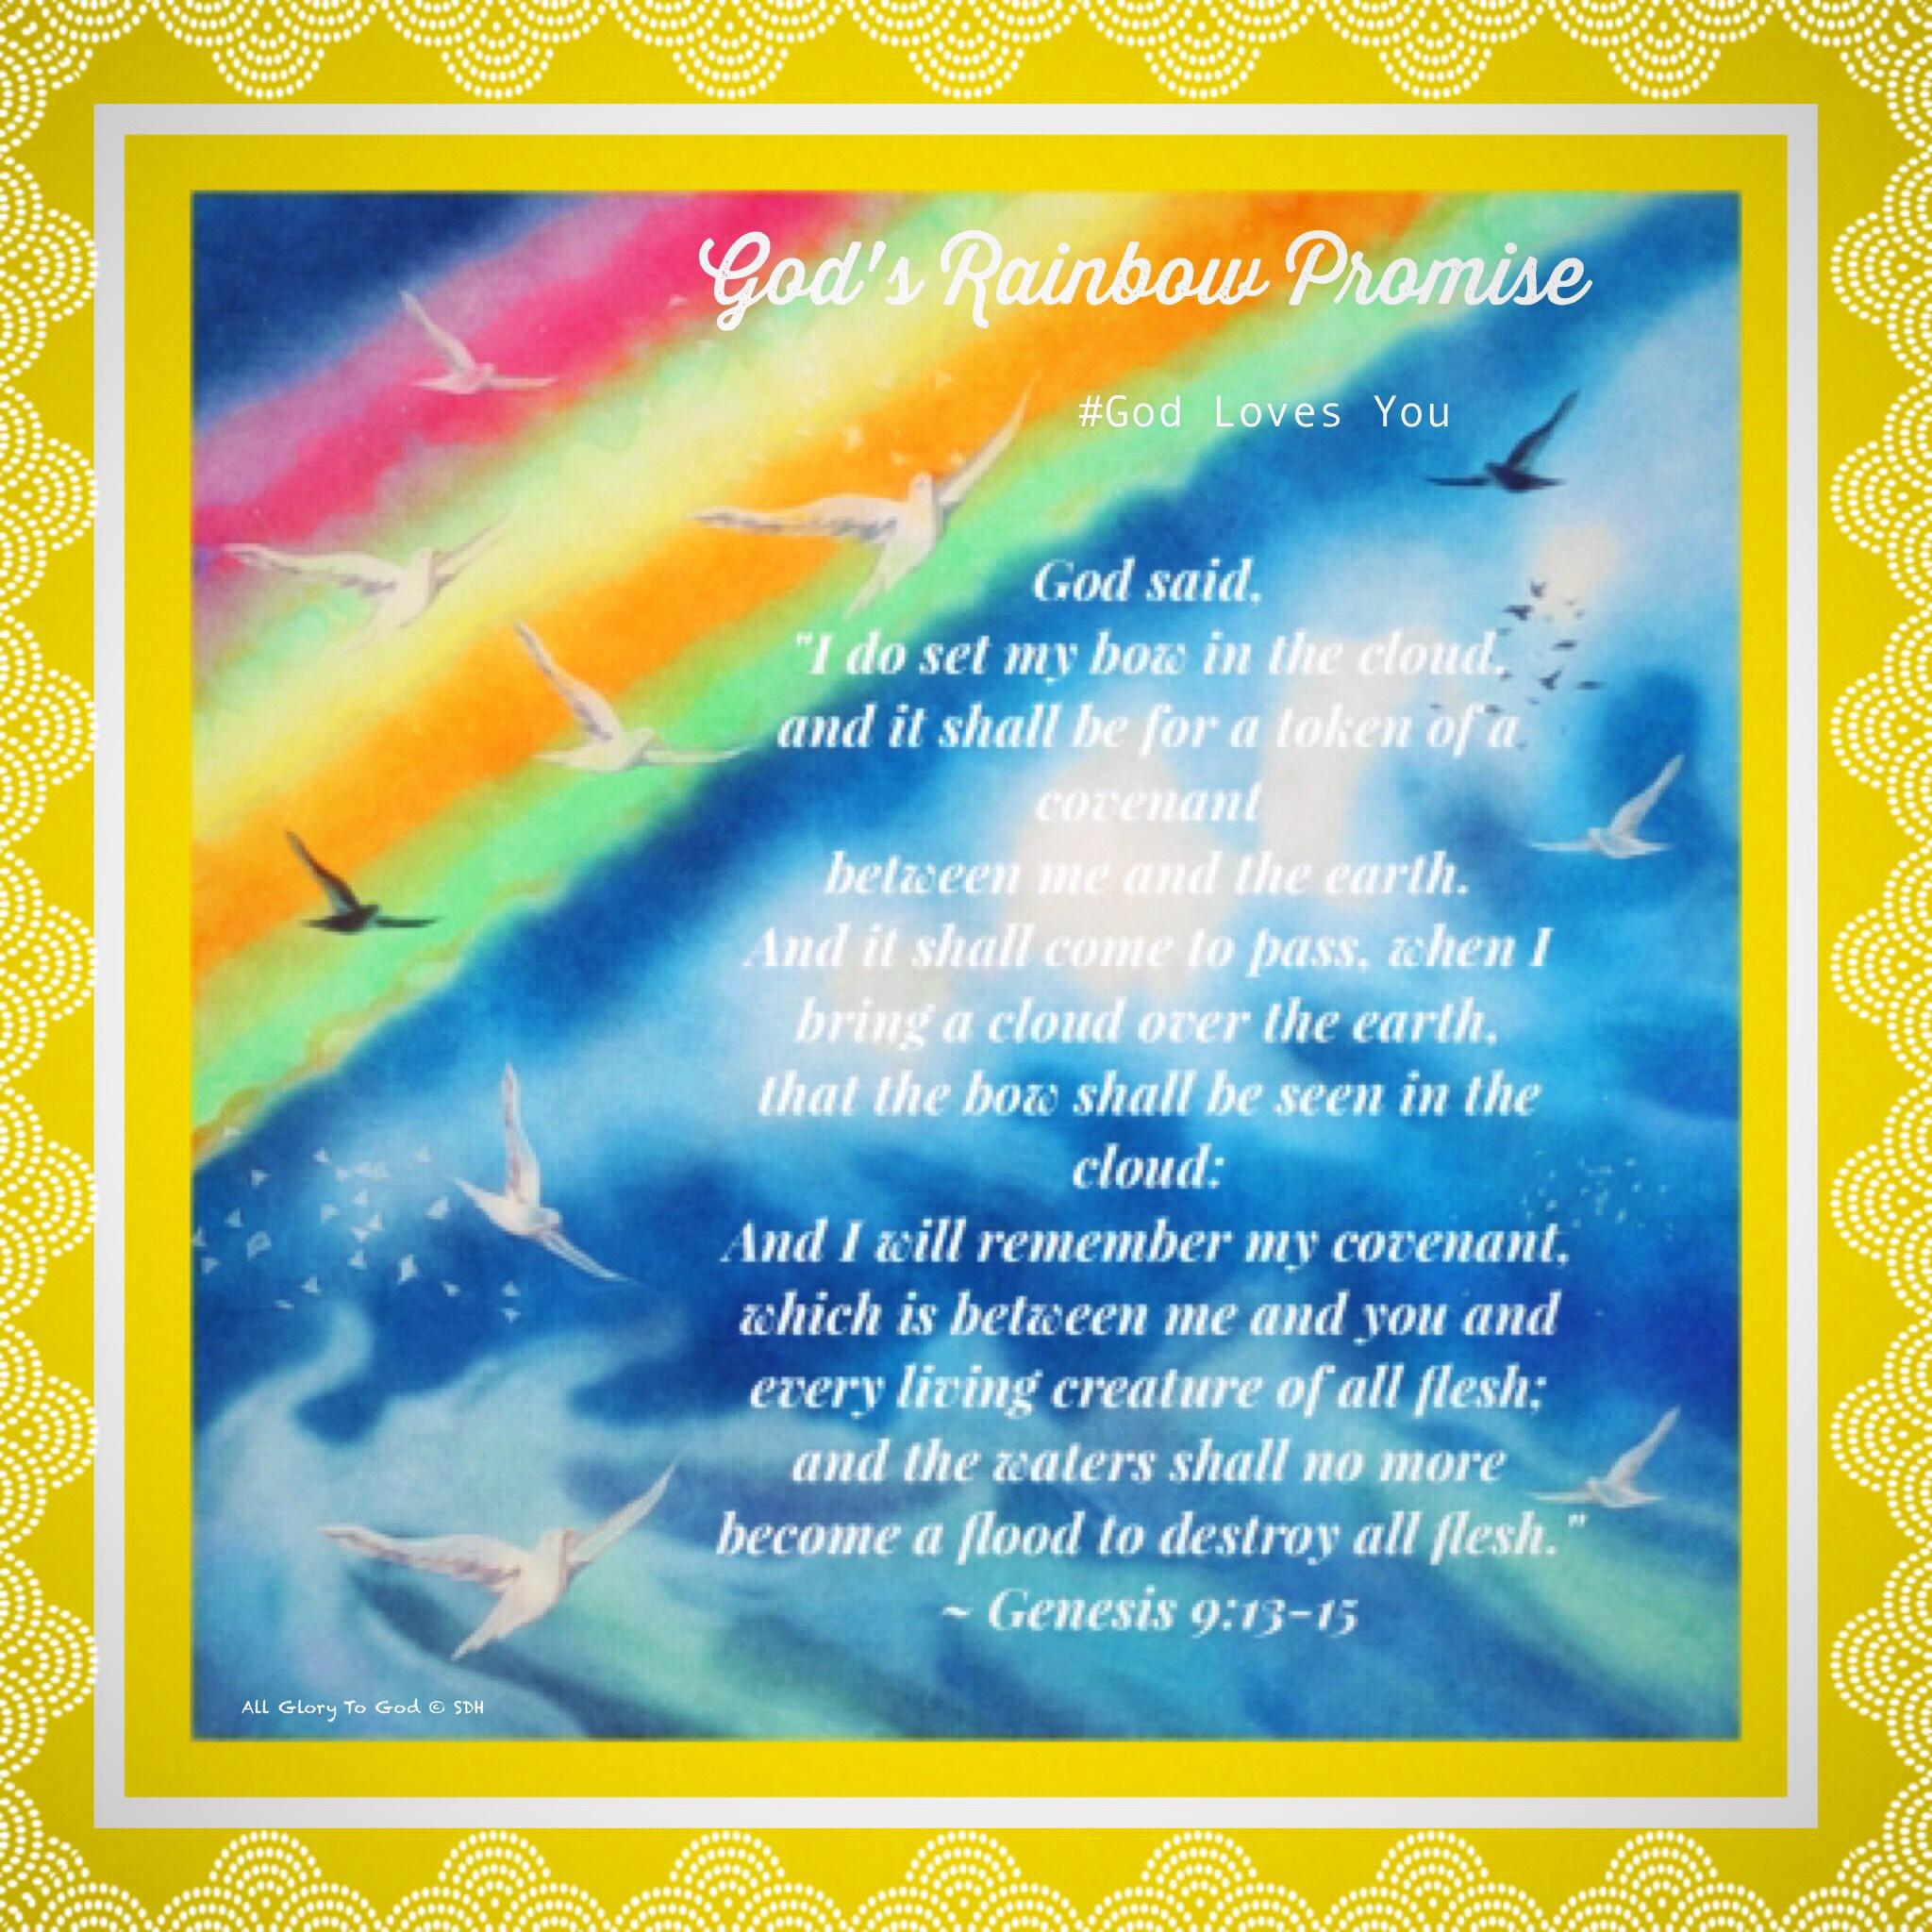 Gods Rainbow promise